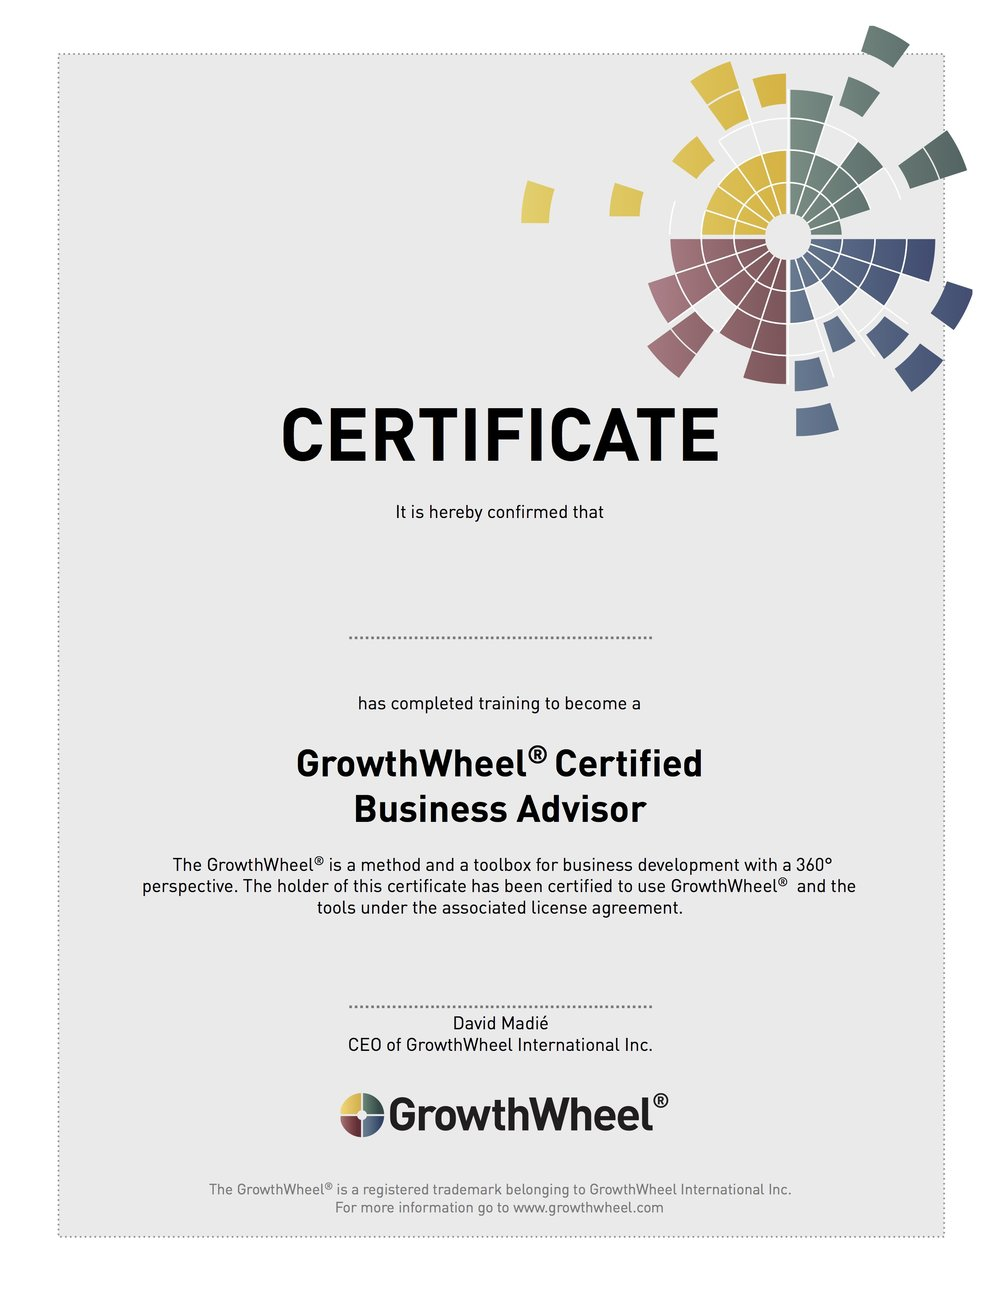 Certificates_TEMPLATE.jpg